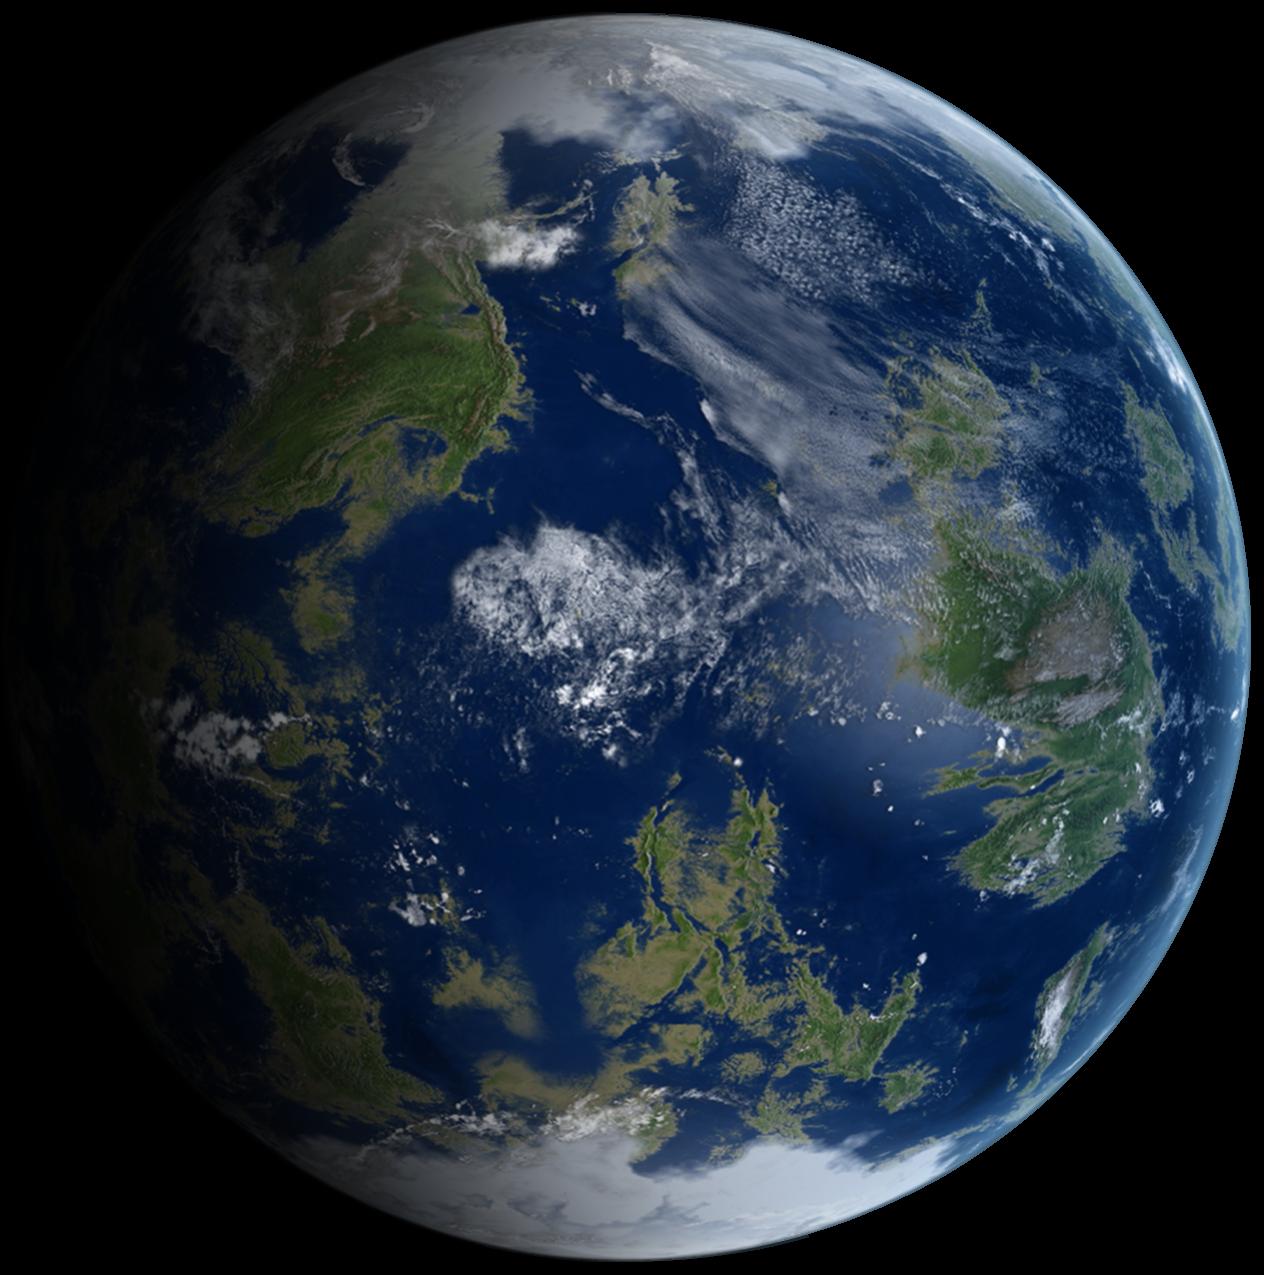 gliese 832c planet history - photo #21